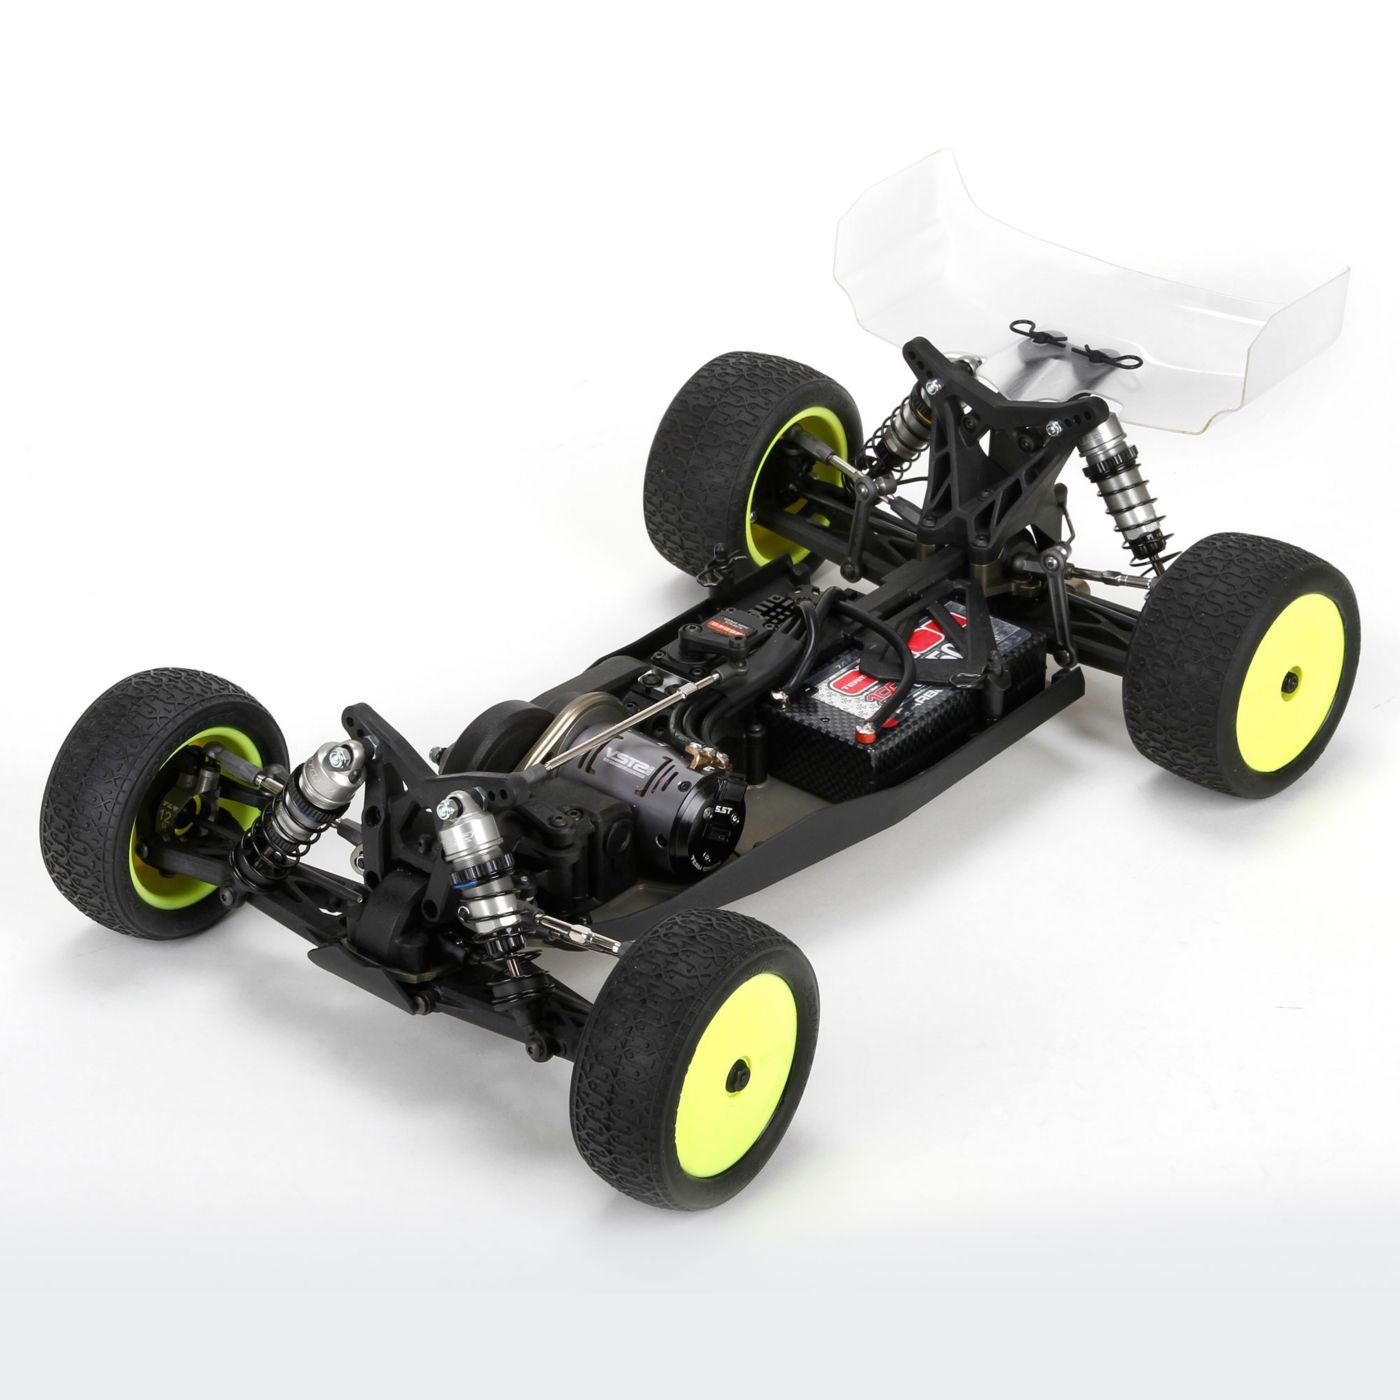 Team Losi Racing 22-4 2 0 1/10 4WD Electric Buggy Kit